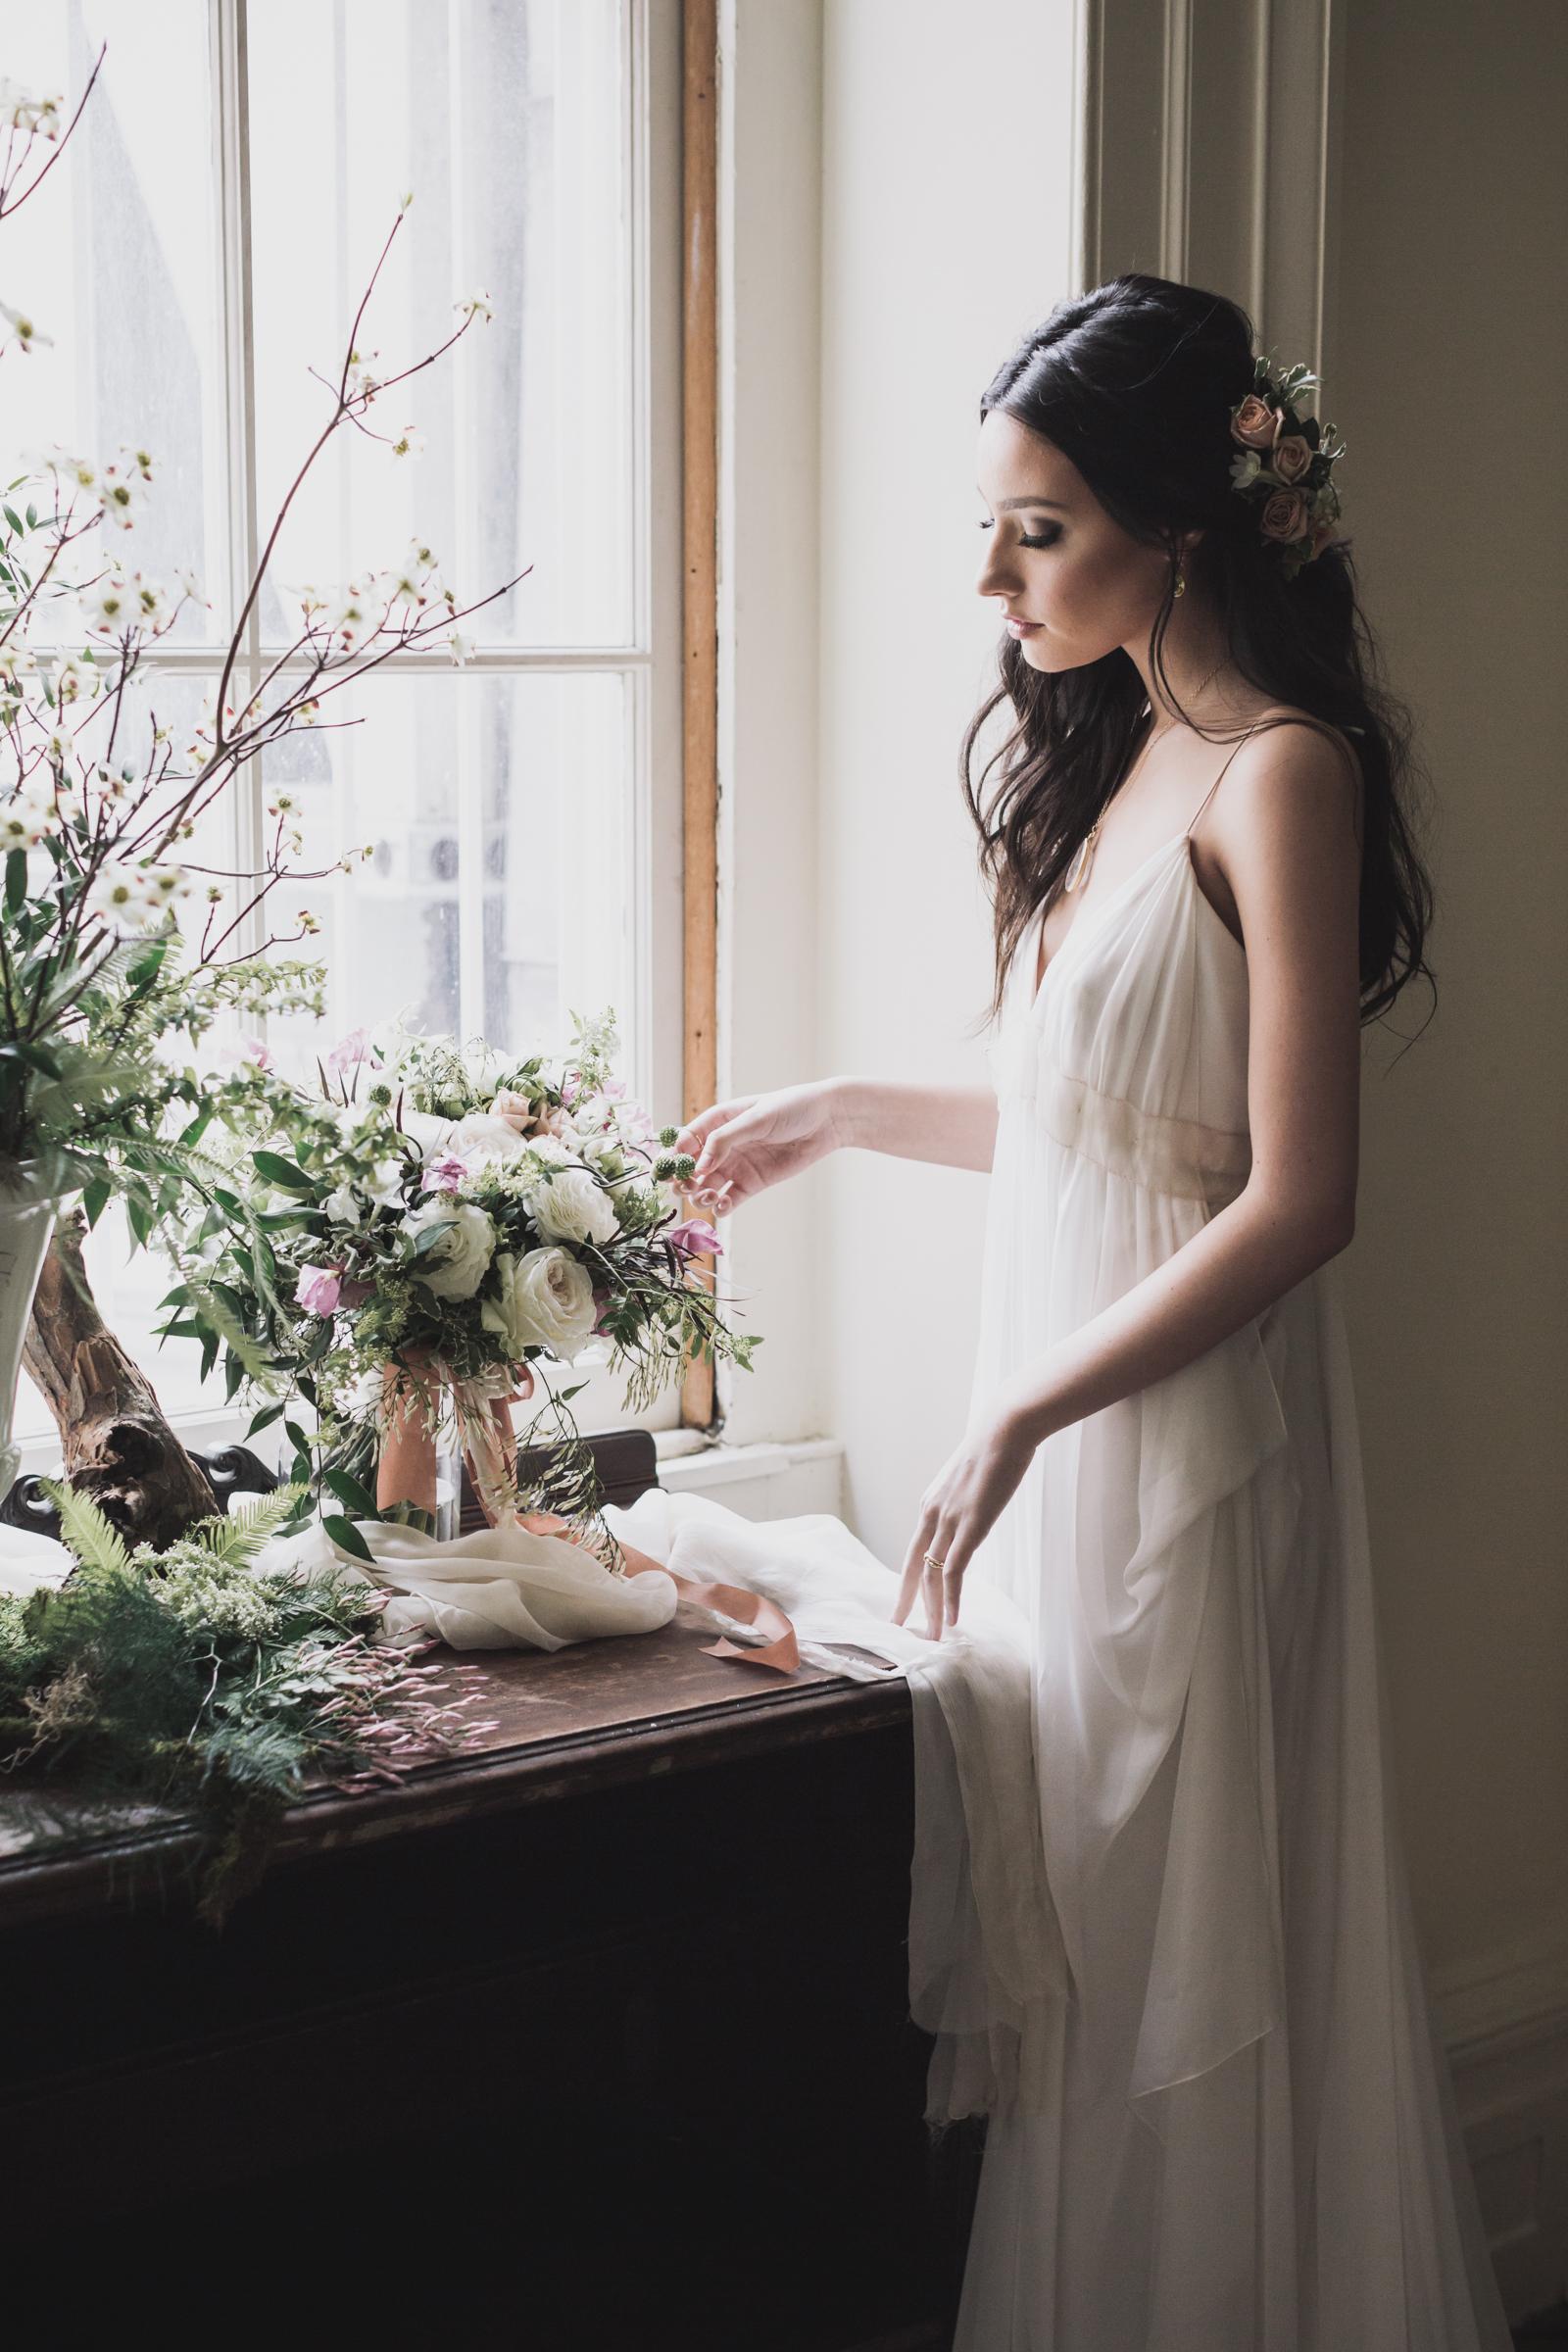 20160310-085-Barrow_Mansion_Wedding_Editorial.jpg